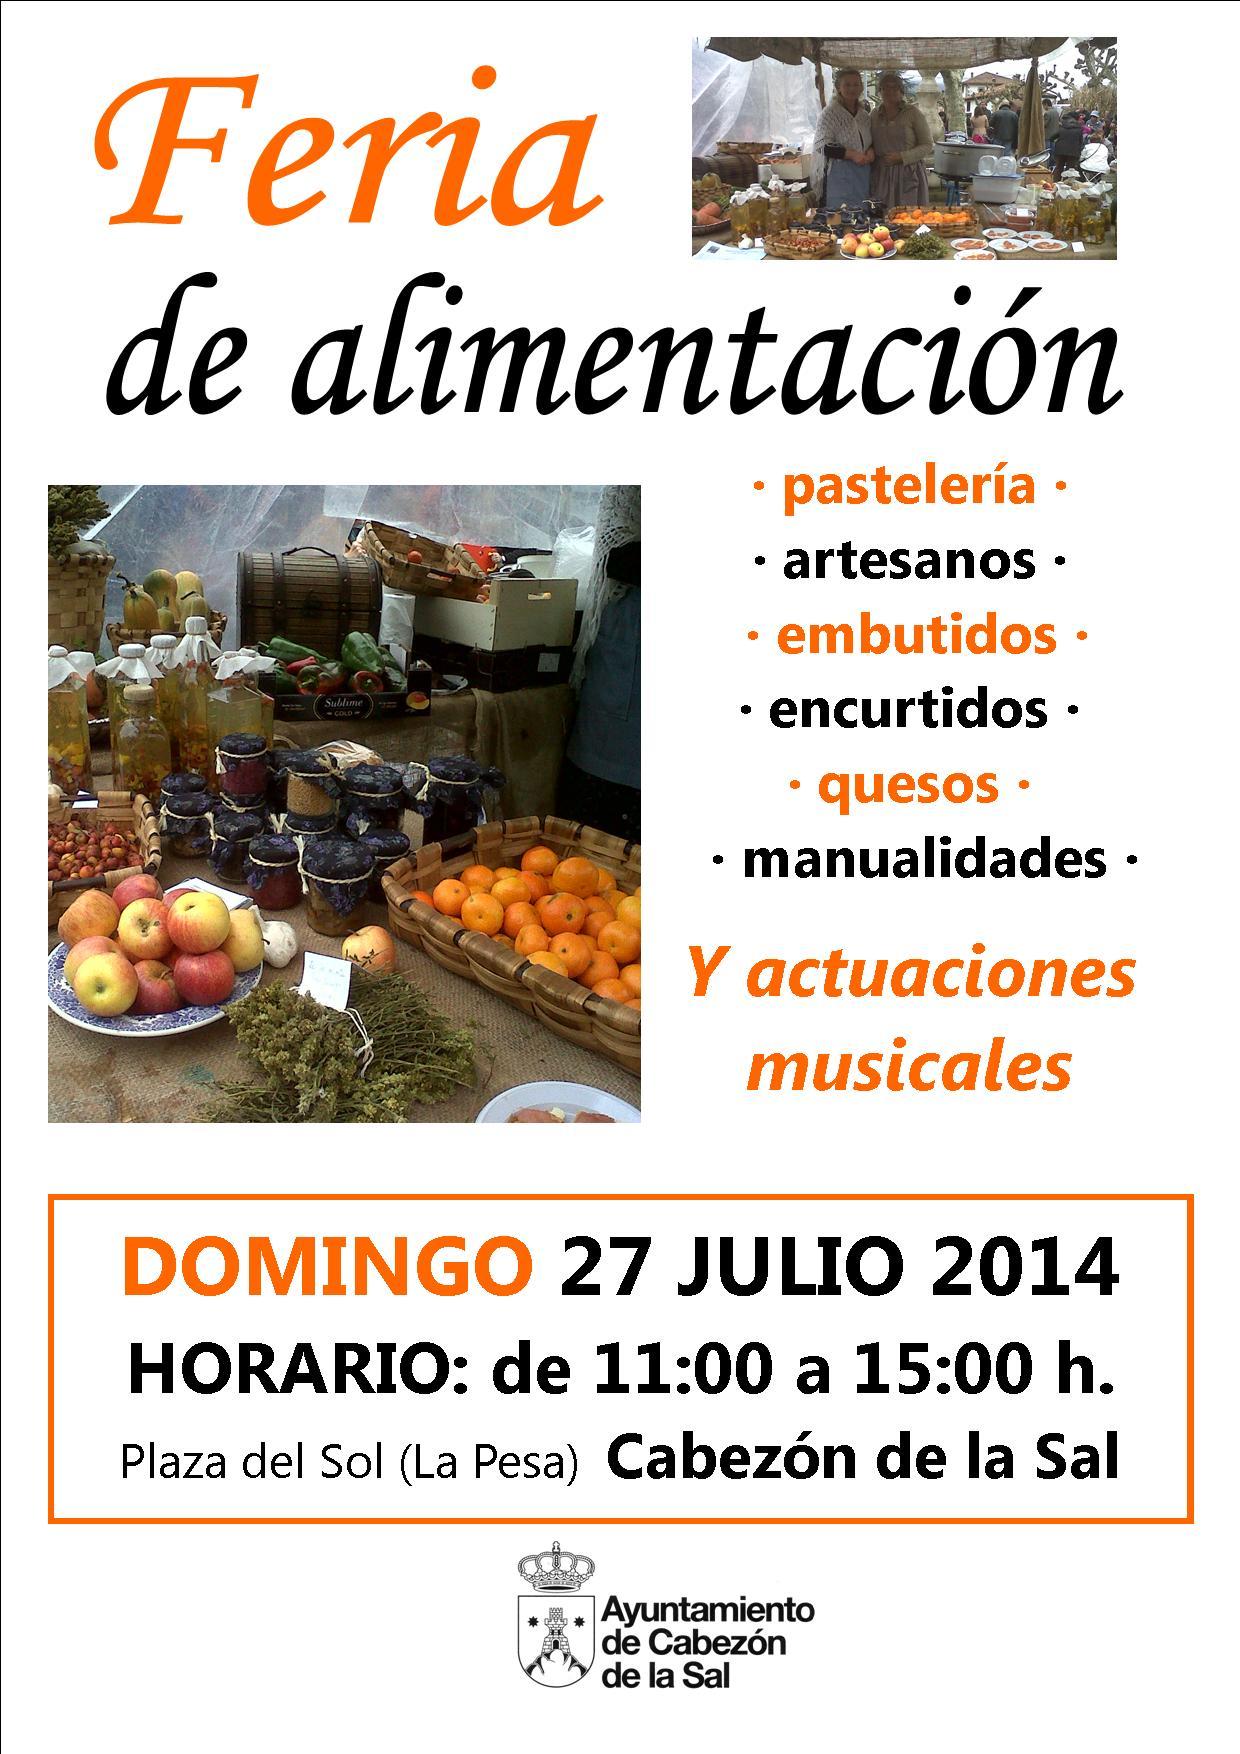 http://www.cabezondelasal.net/wp-content/uploads/2014/07/cartel-feria-alimentaci%C3%B3n-julio-2014-la-pesa.jpg